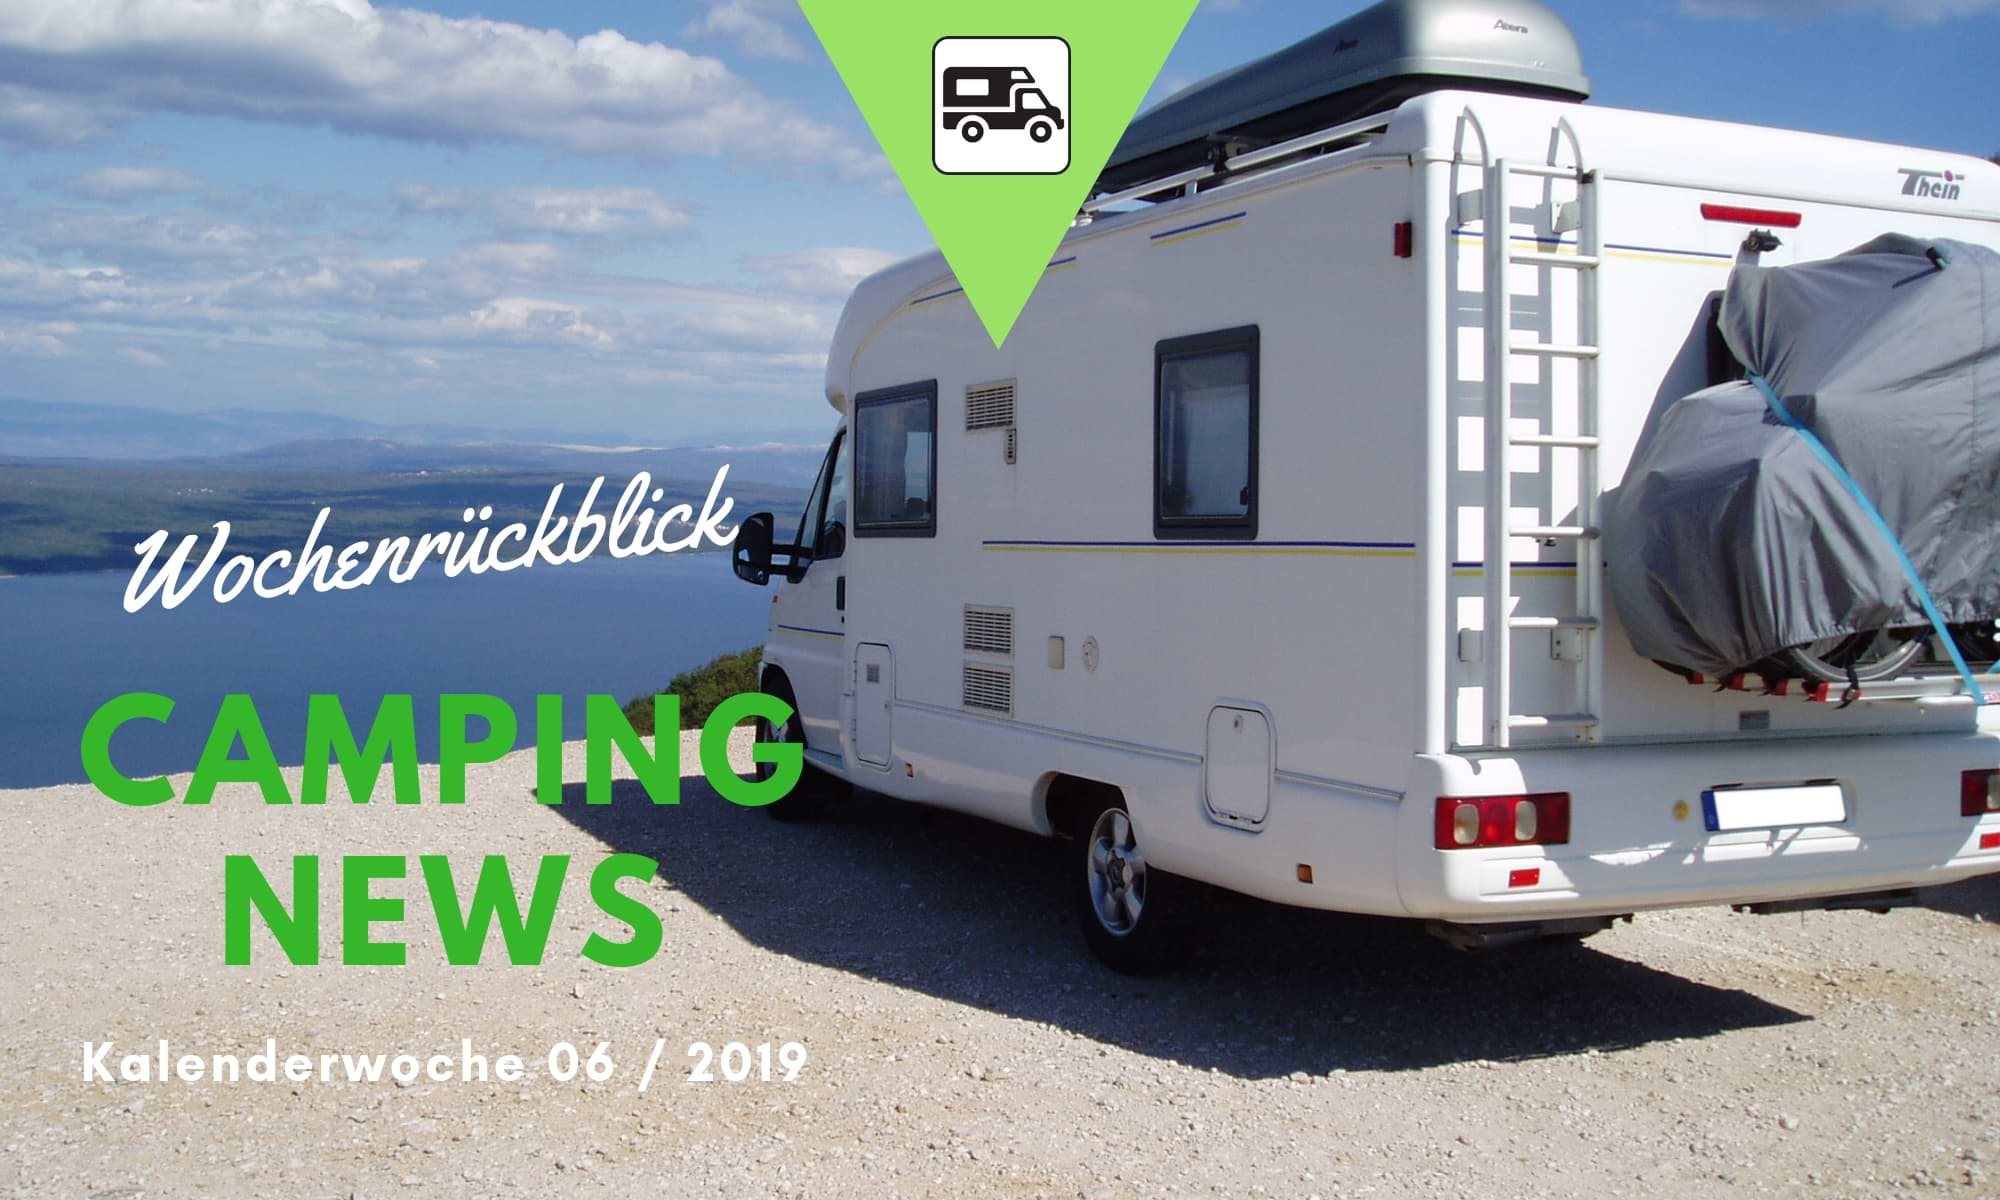 Wochenrückblick Camping News KW06-2019